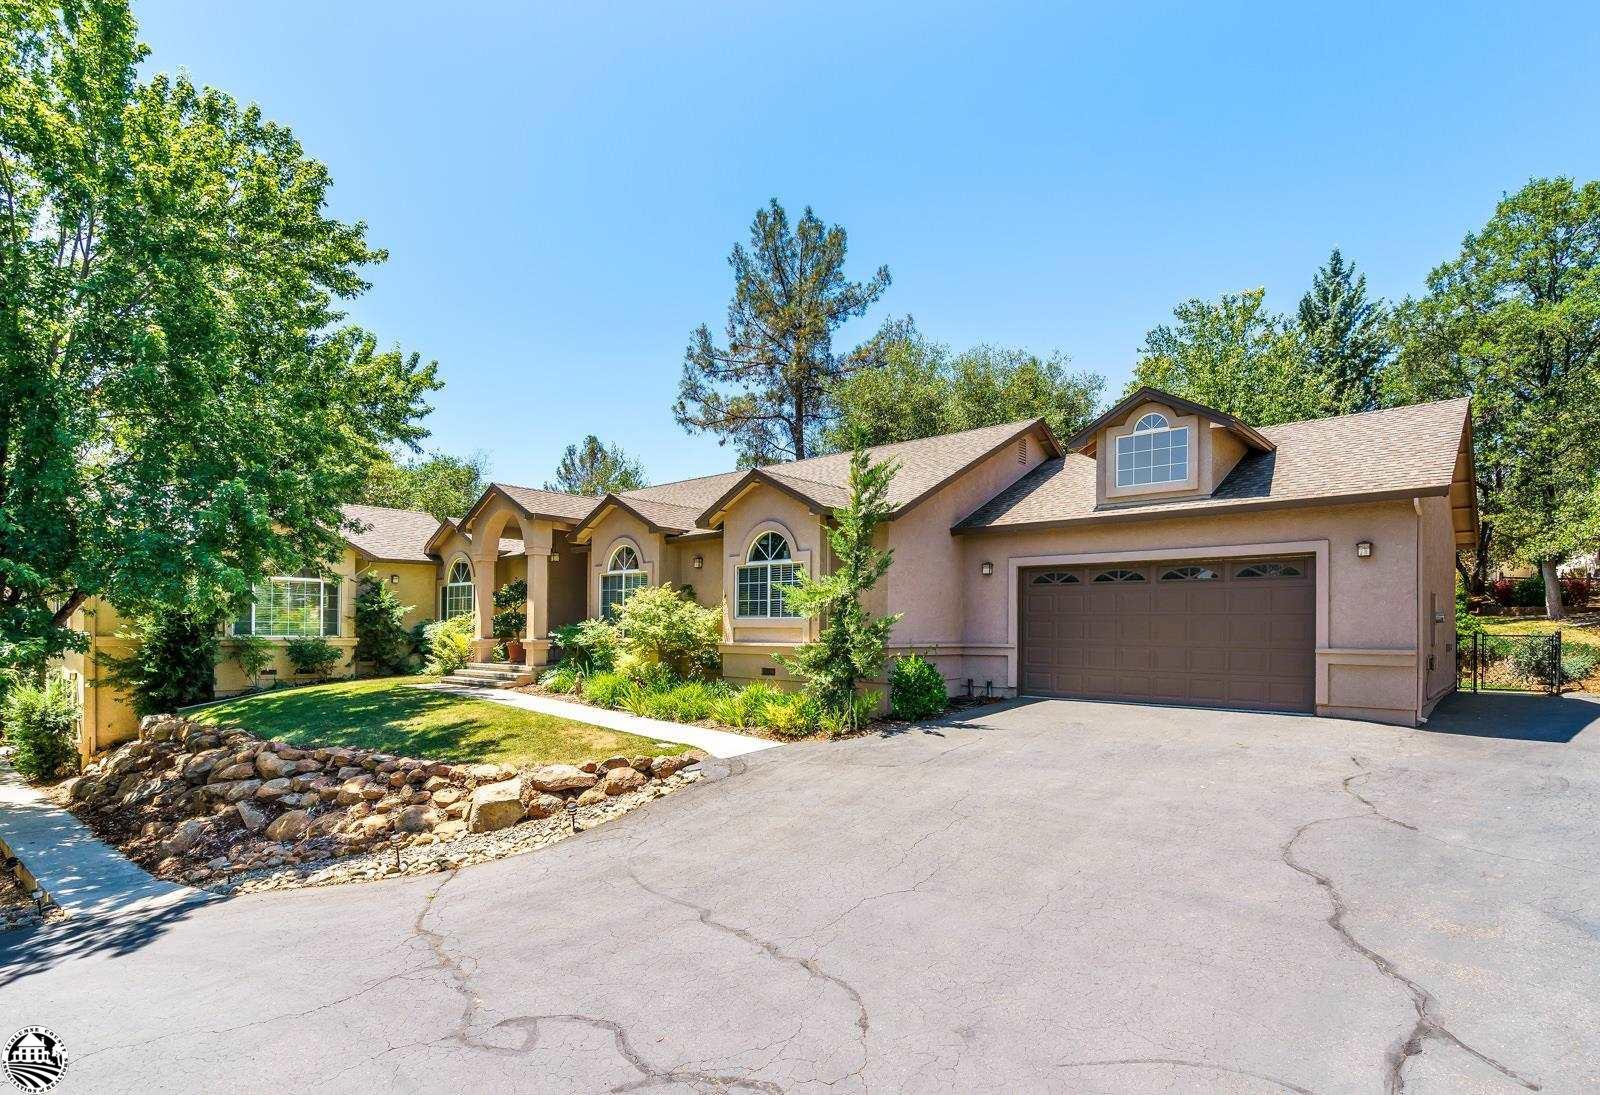 14115 Stanton Circle, Sonora, CA 95383